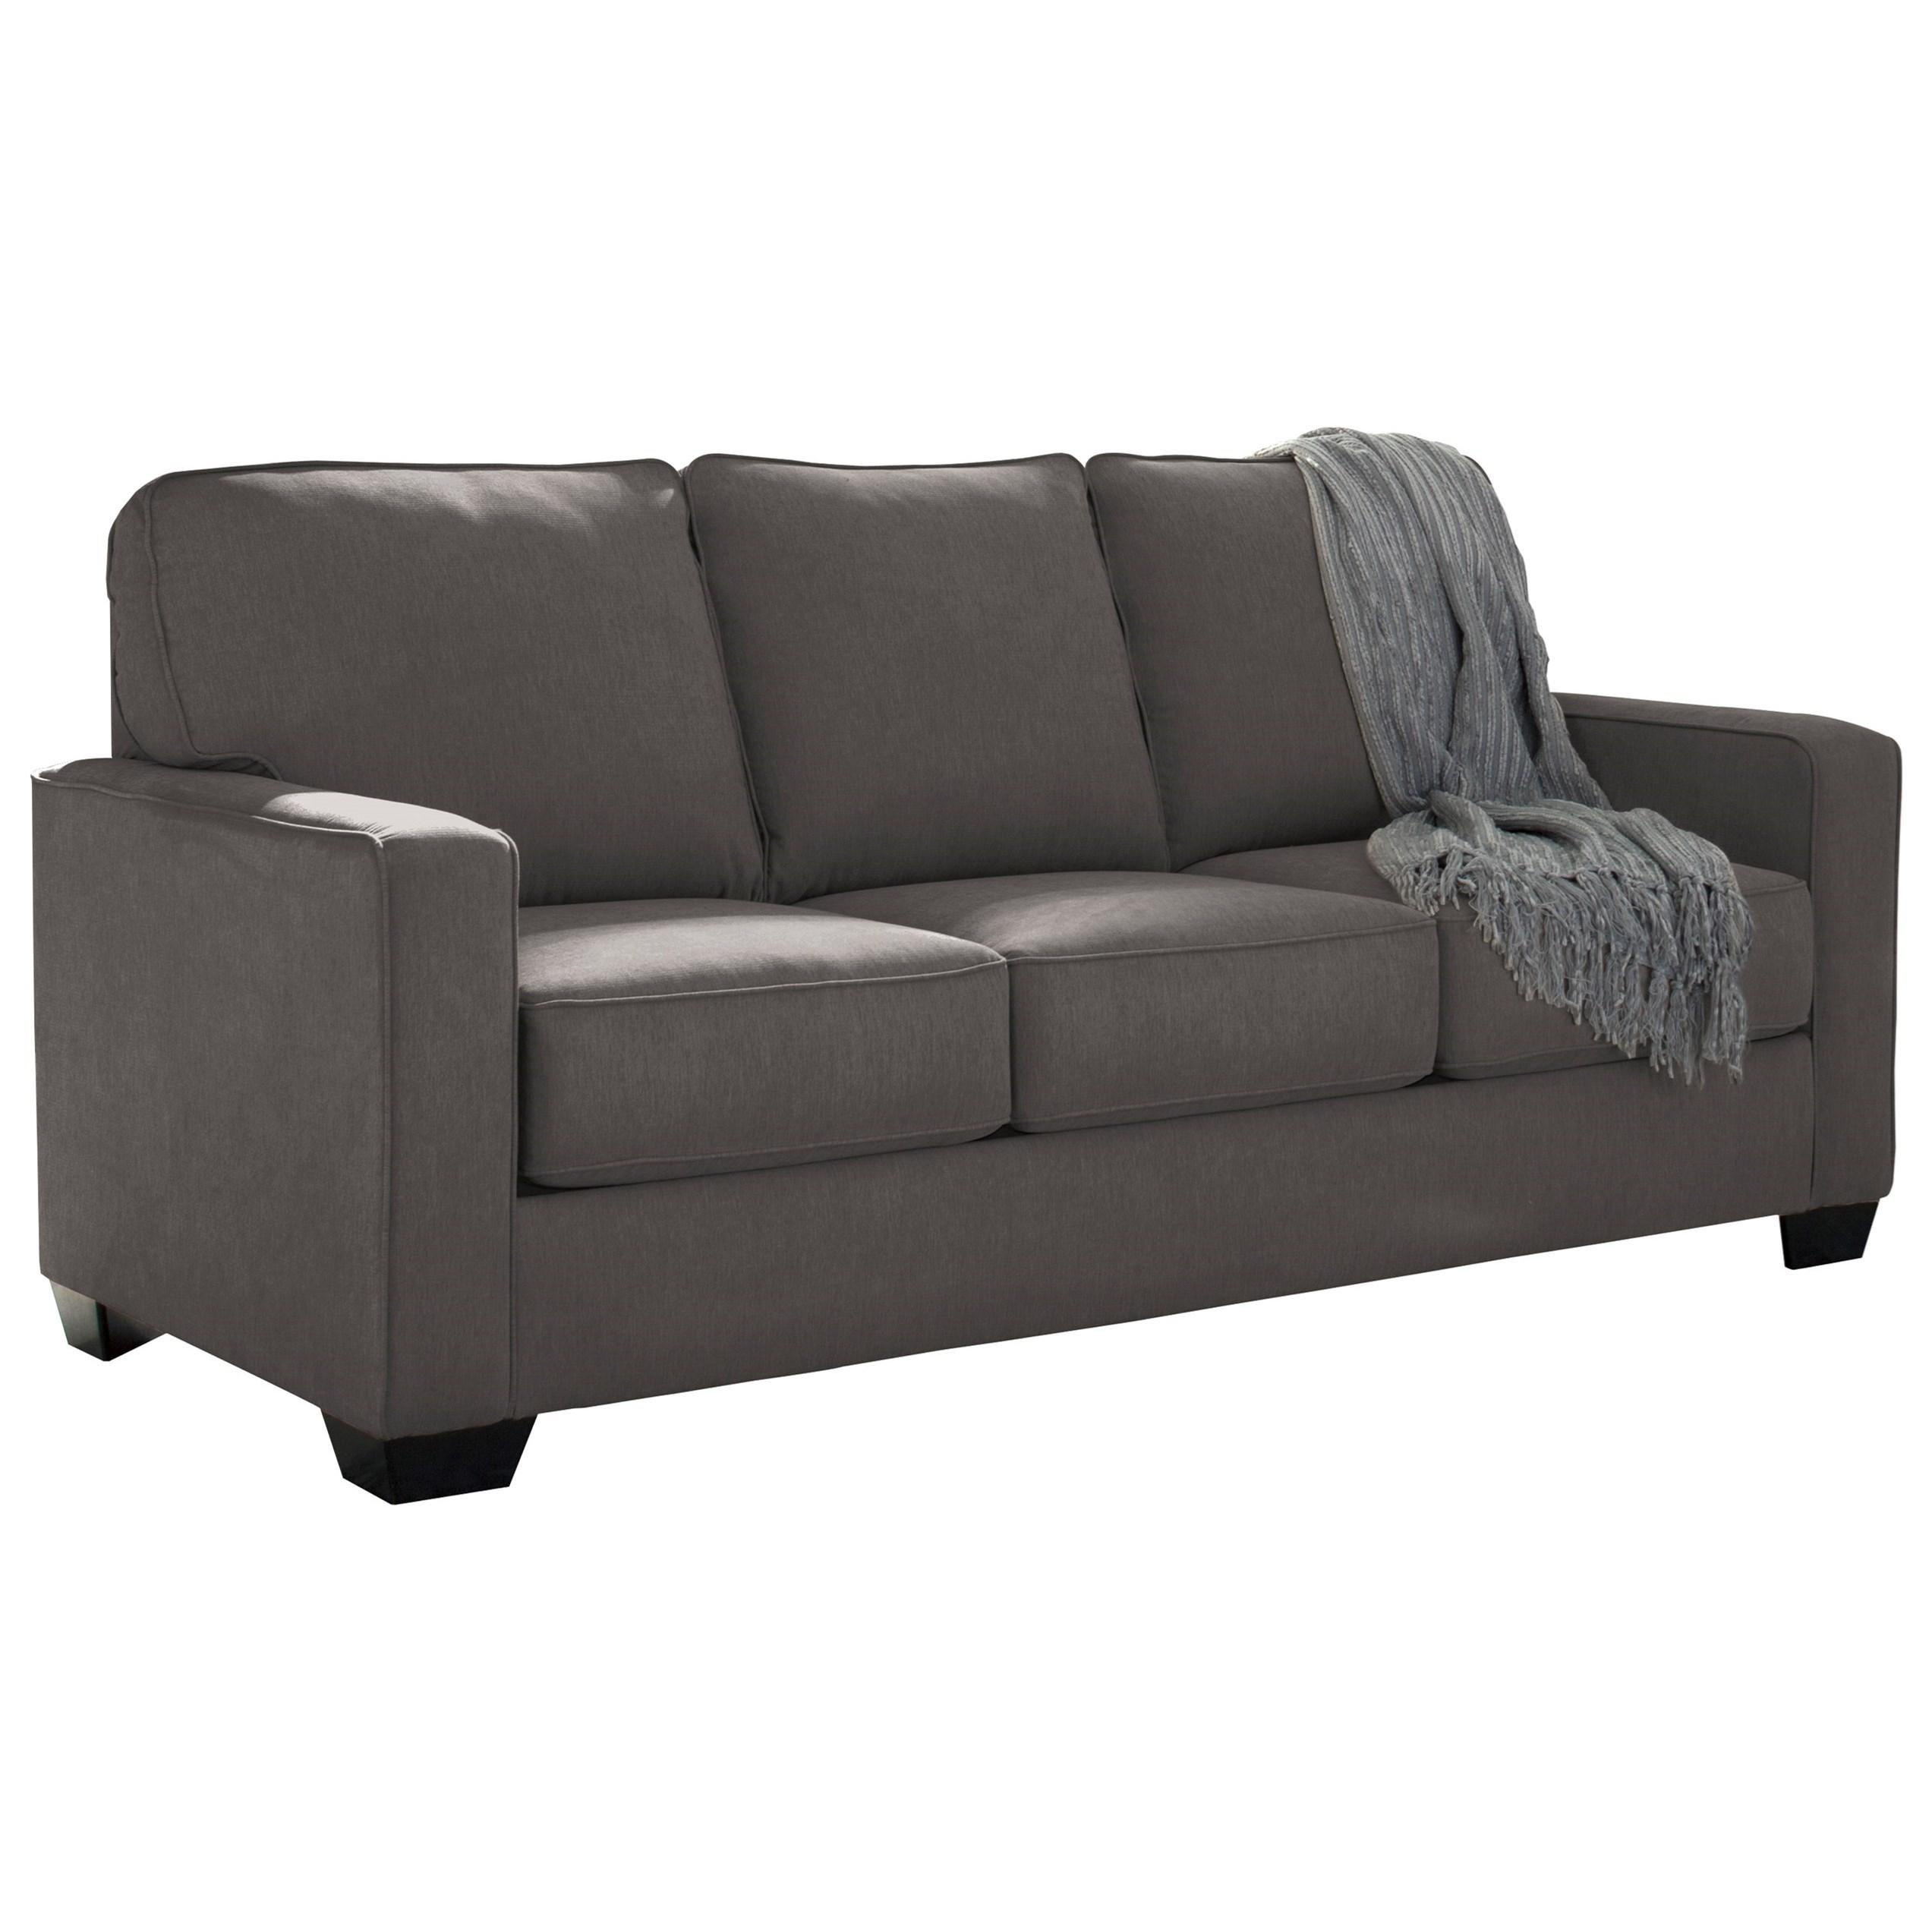 Ziggy Full Sofa Sleeper